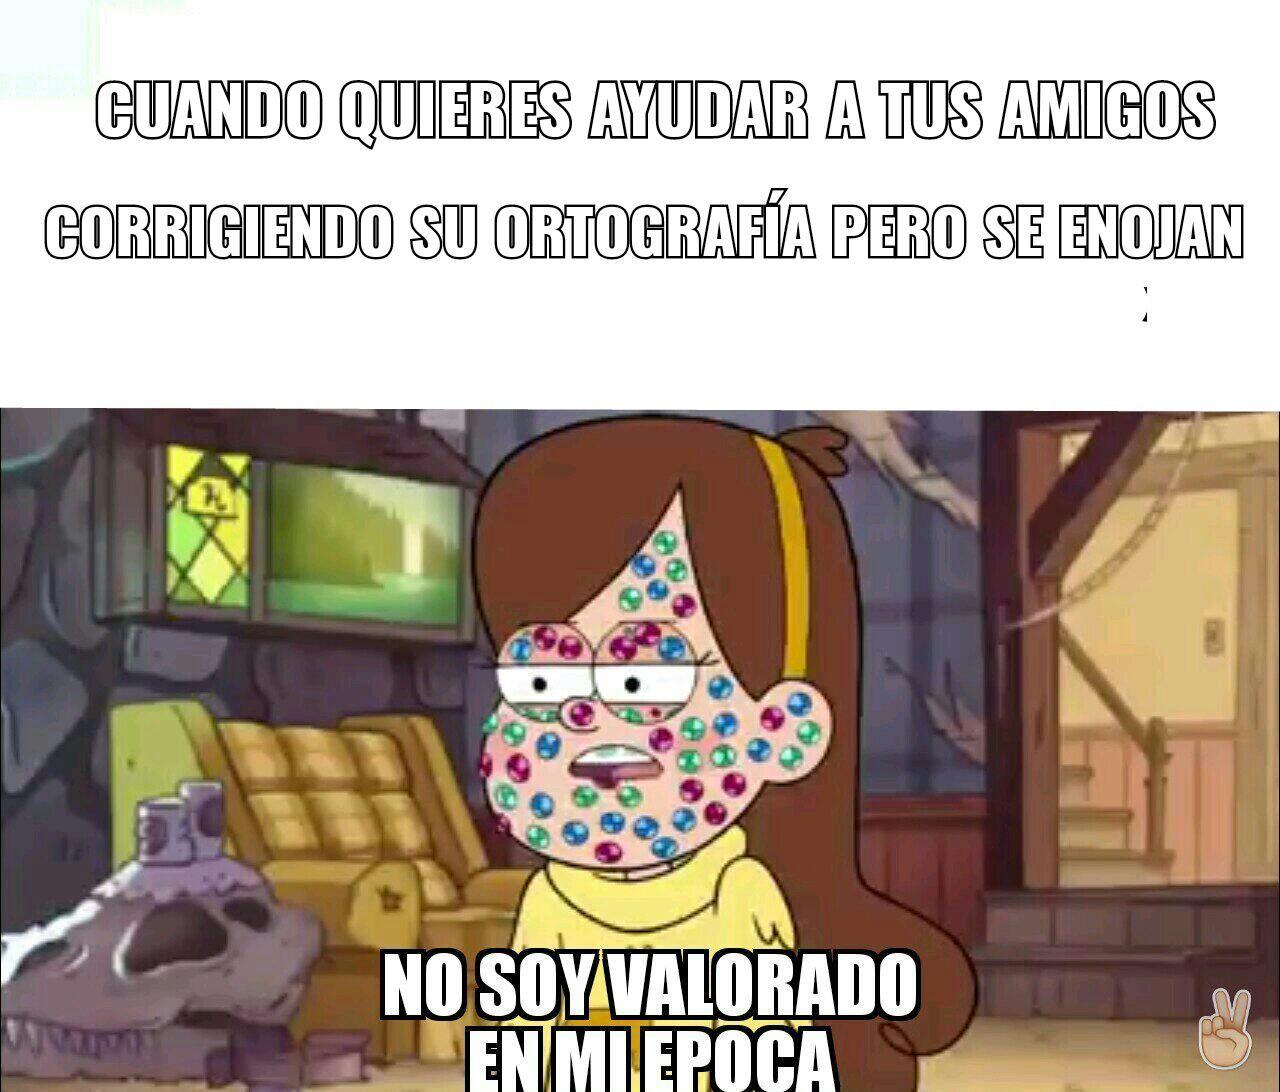 Demonios!!! - meme